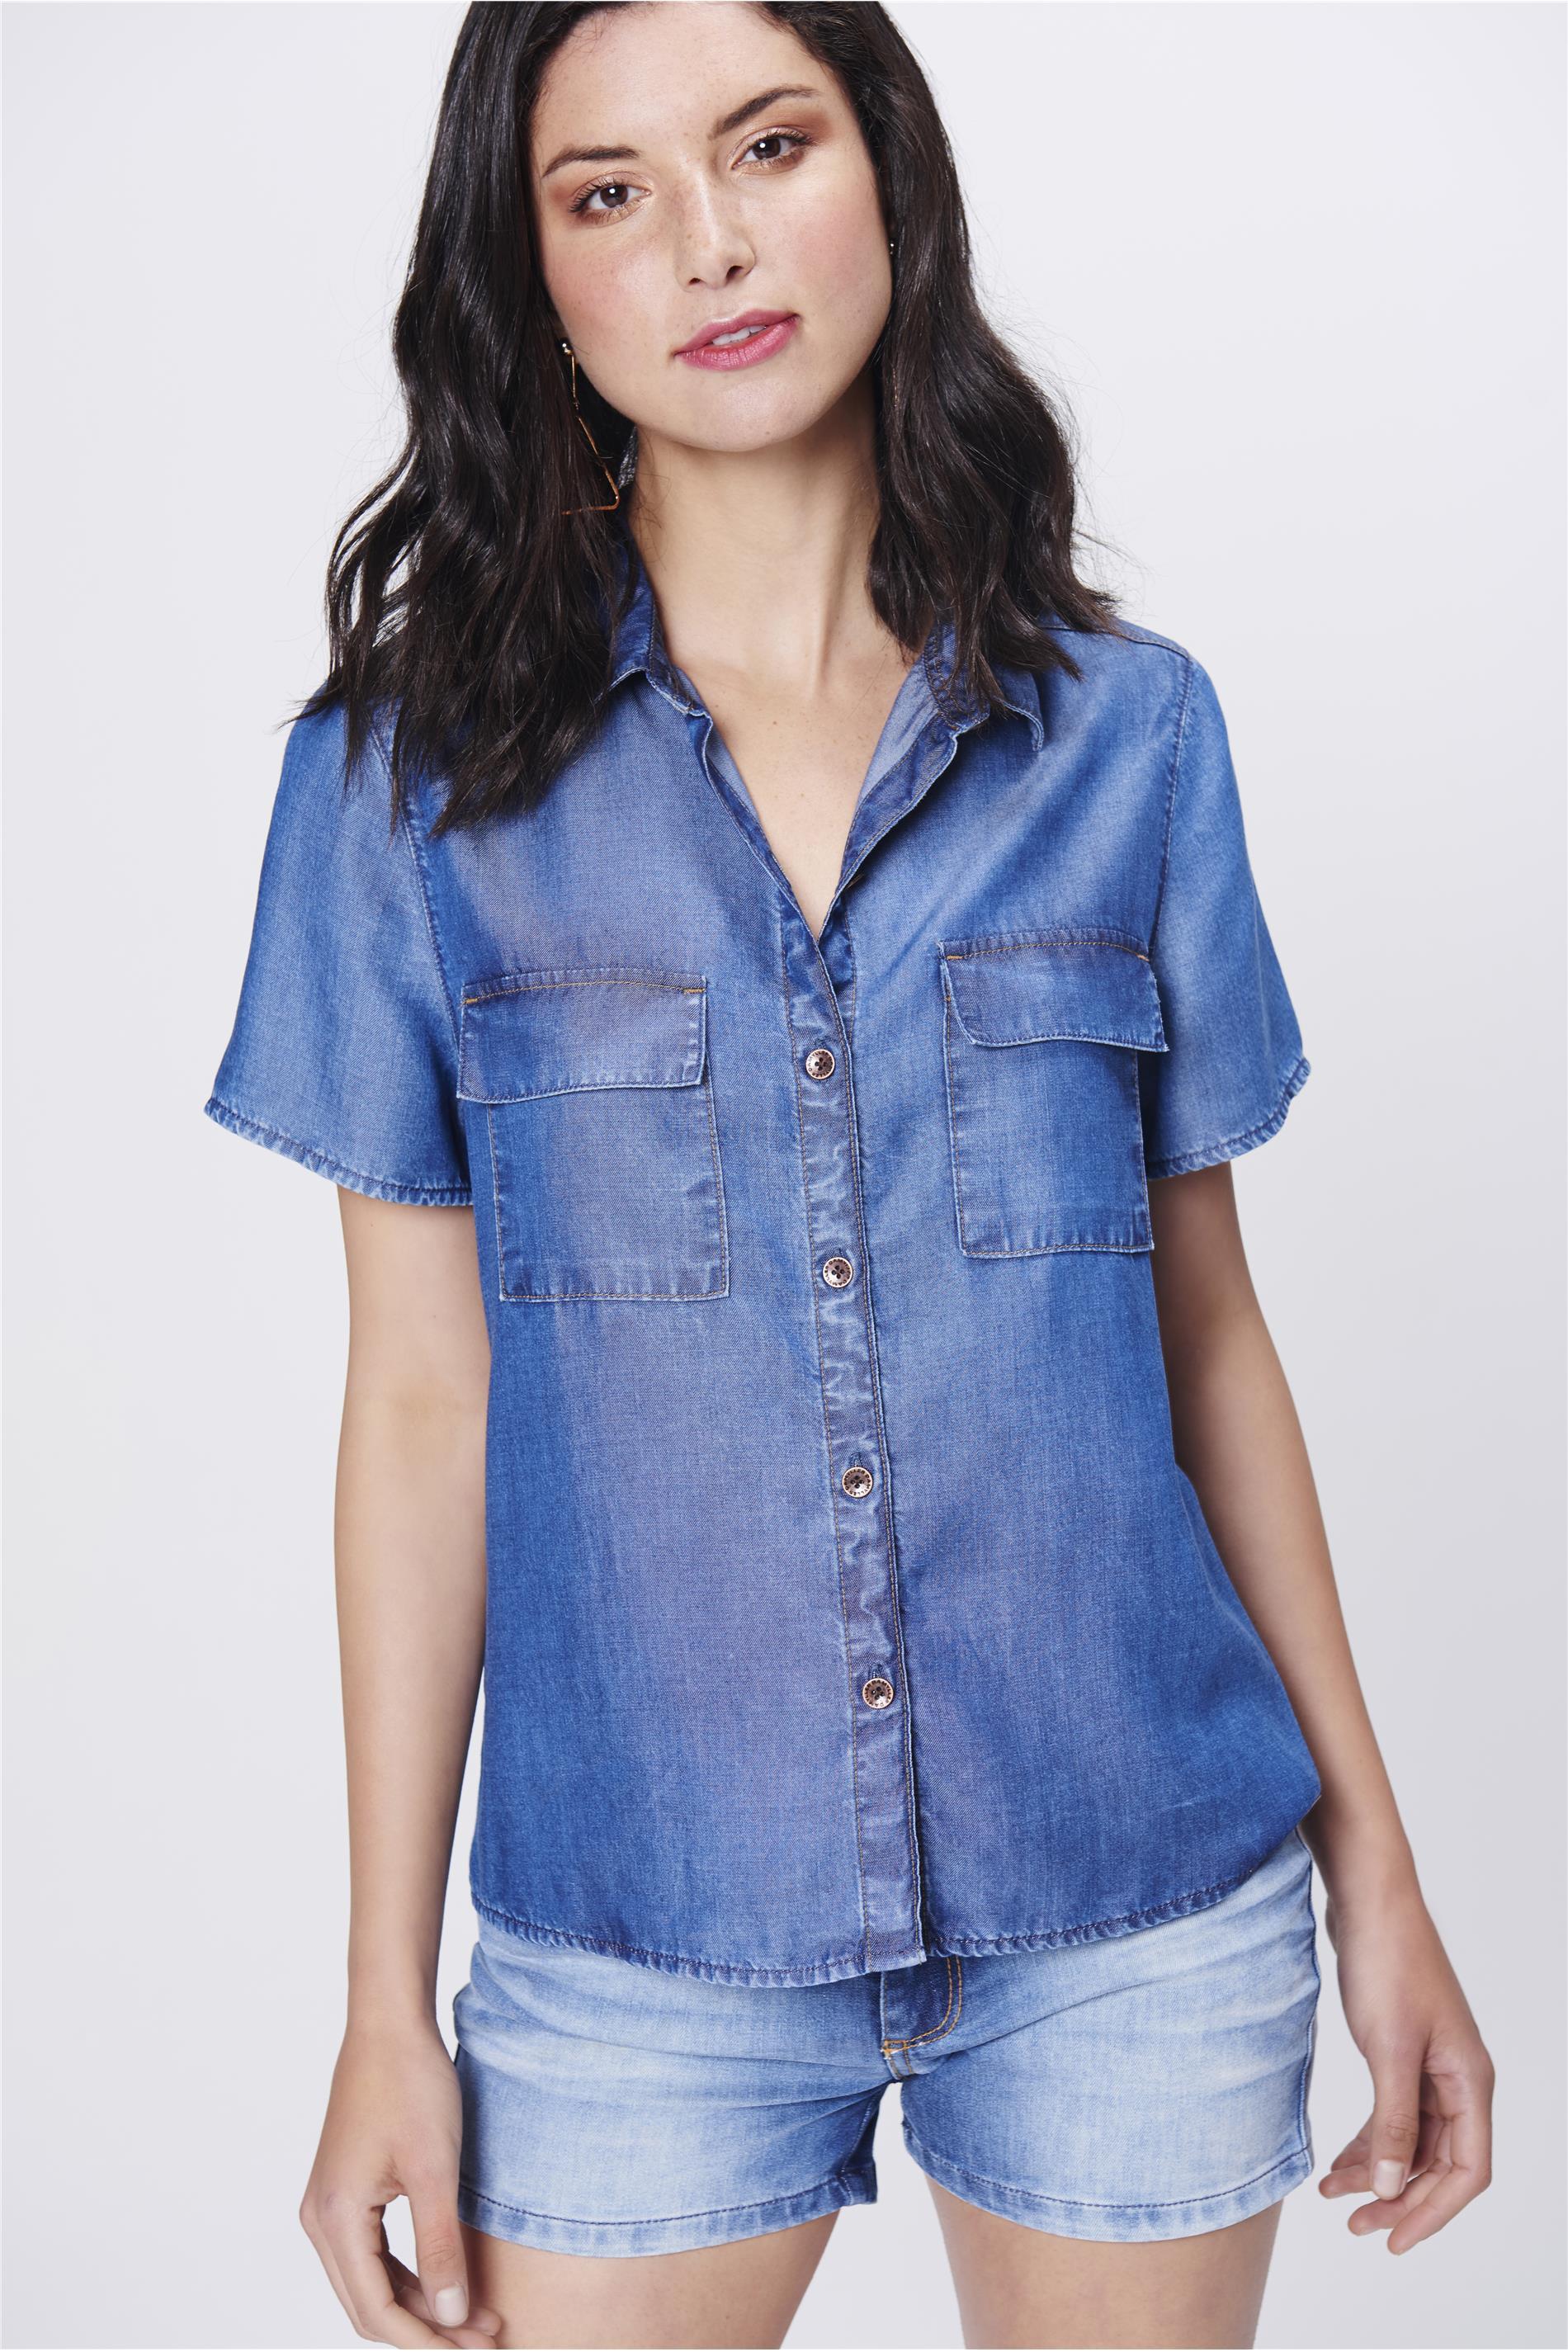 4615c949f Camisa Jeans de Manga Curta Feminina - Damyller